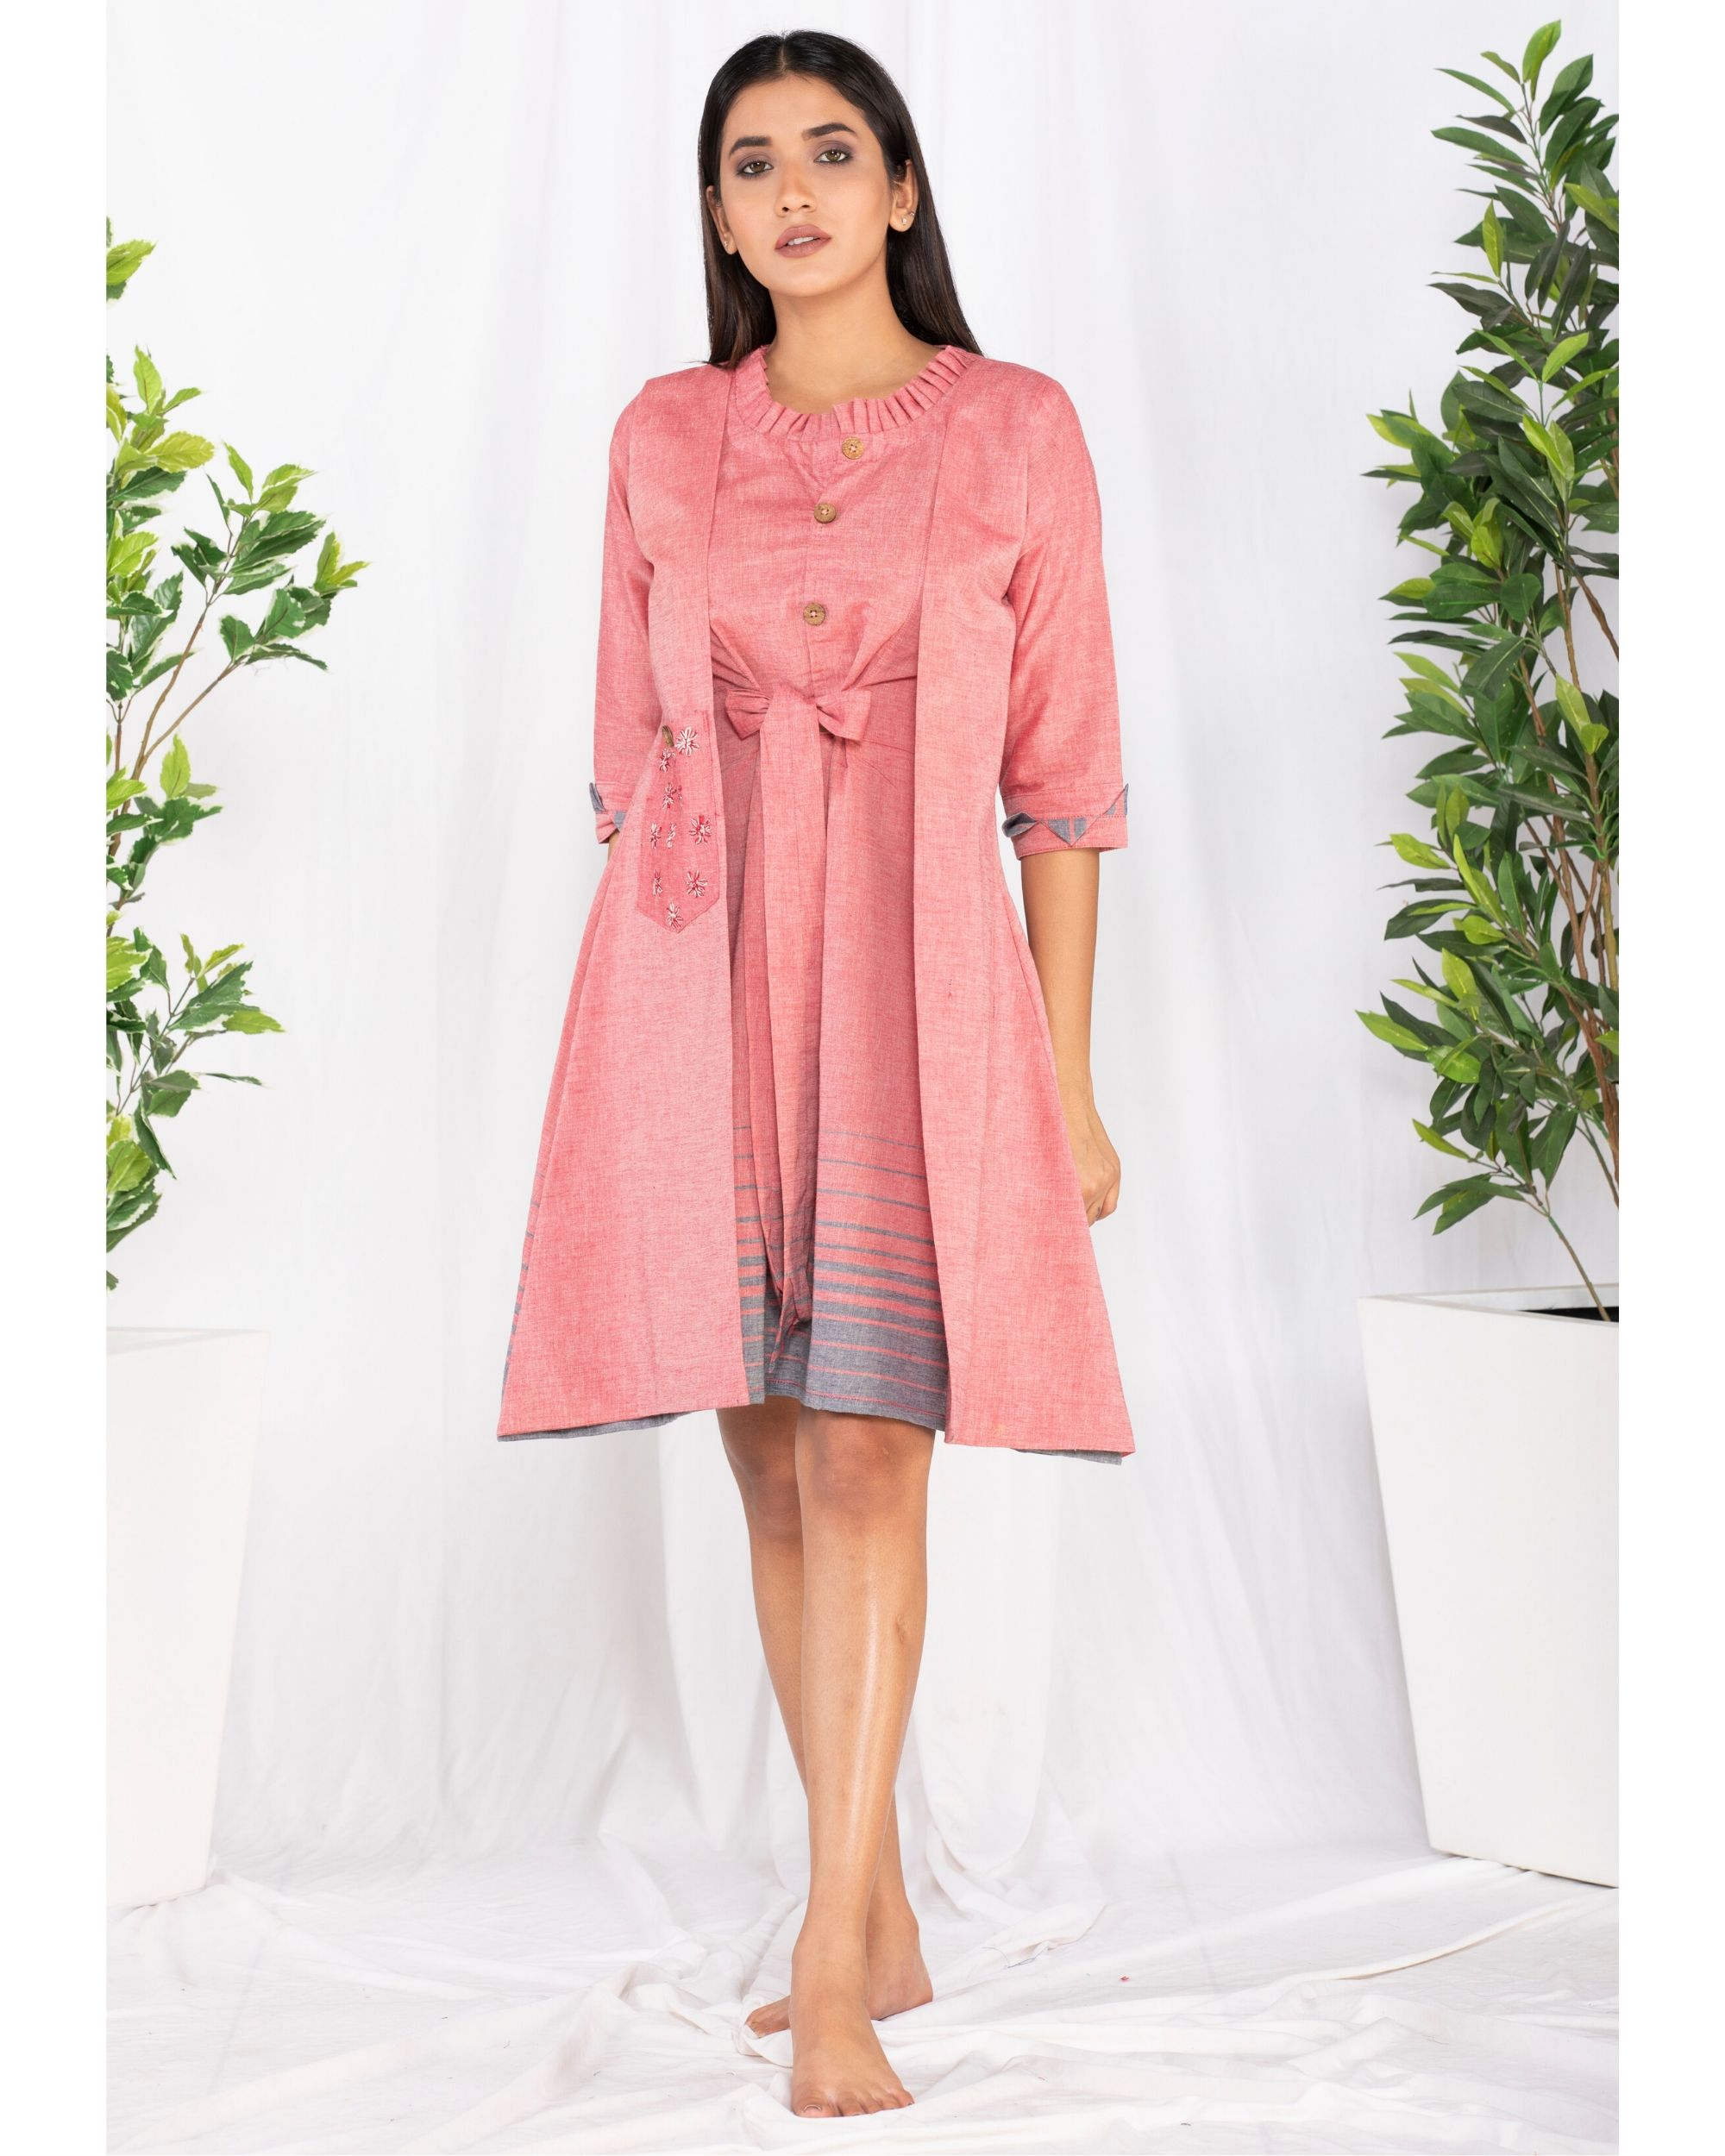 Pink printed overlap tie-up dress